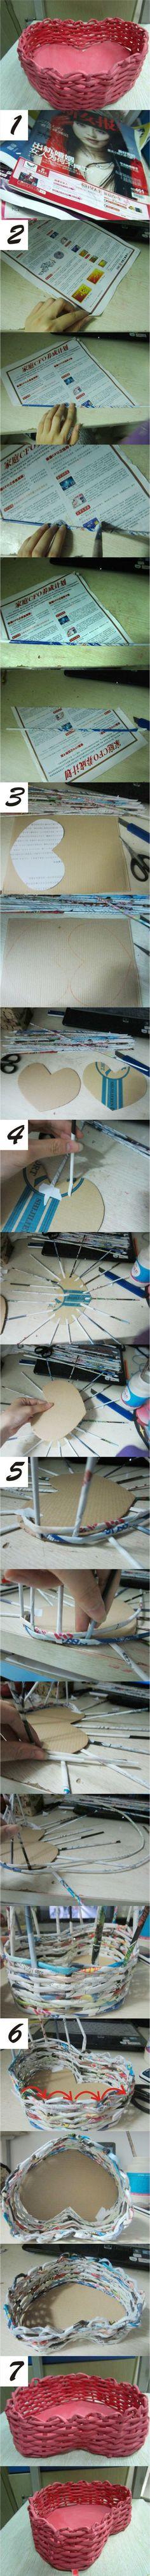 207 best Newspaper, magazine craft images on Pinterest   Basket ...